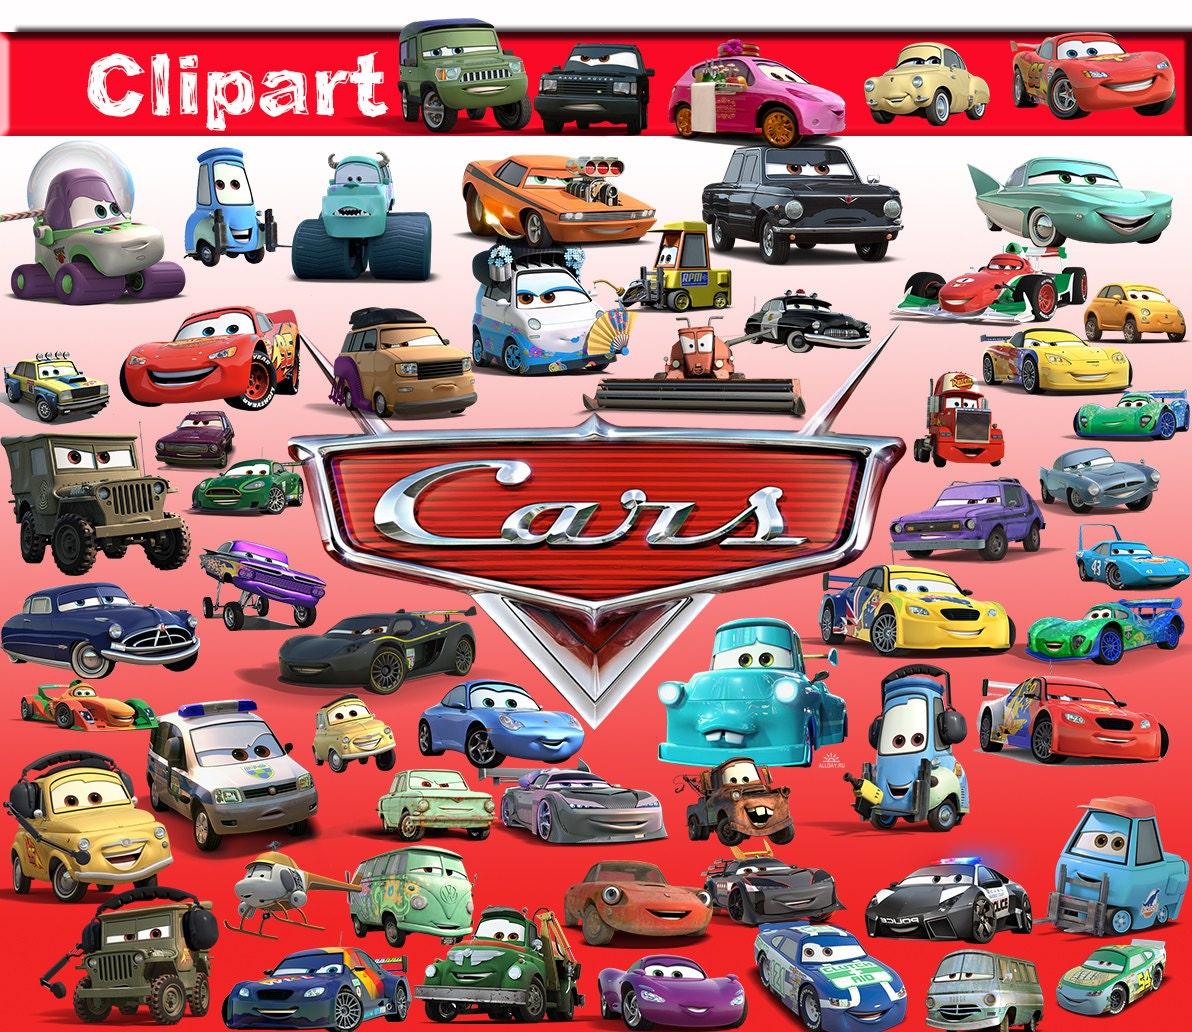 60 Disney Cars ClipArt-Digital Cars Disney Clip Art image-Cars